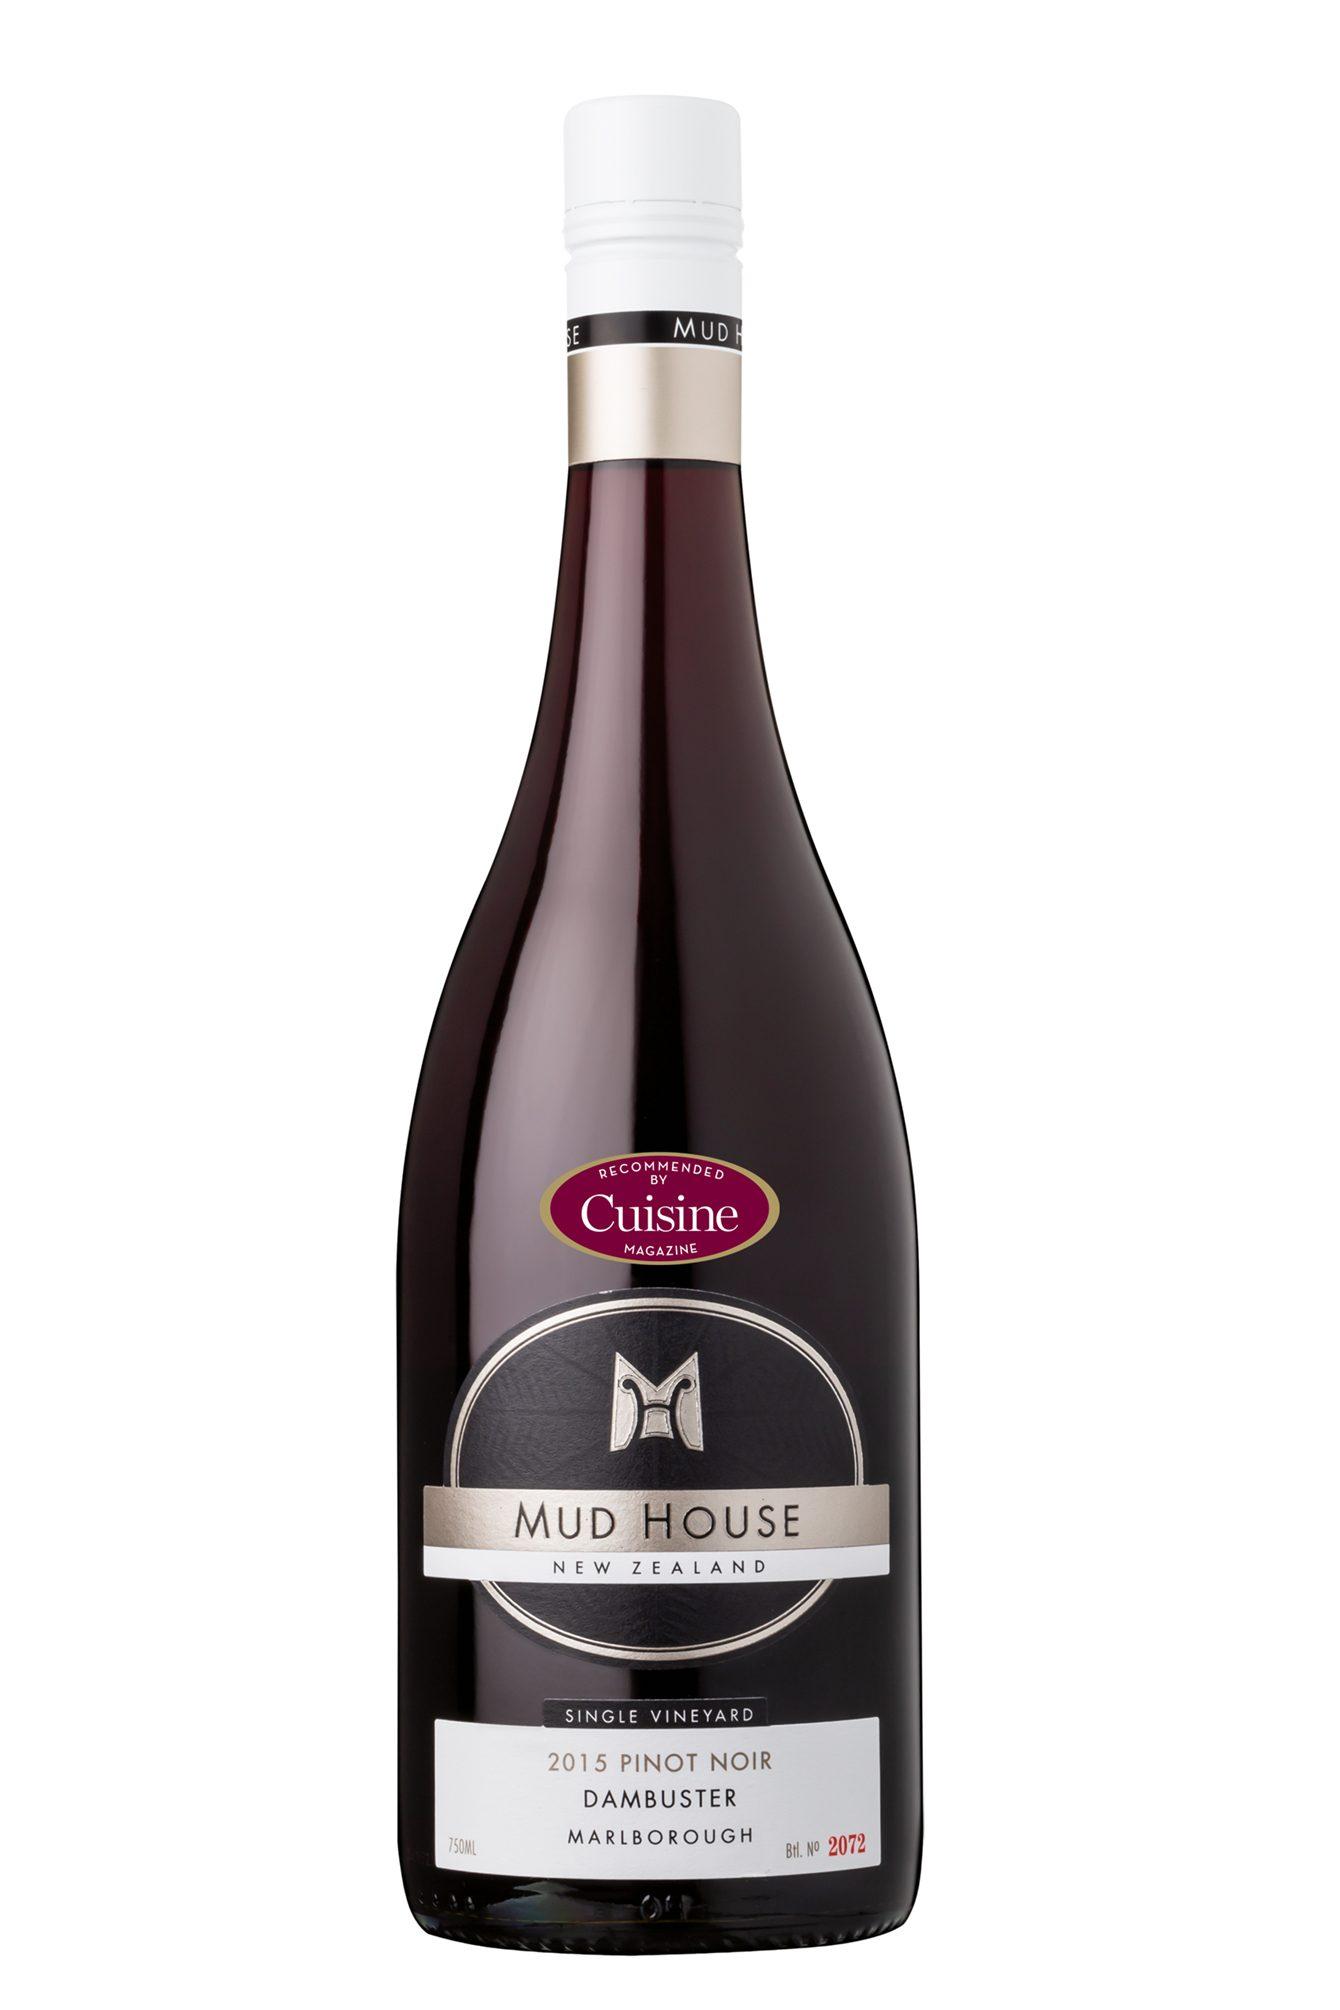 Mud House Single Vineyard Dambuster Marlborough Pinot Noir 2015